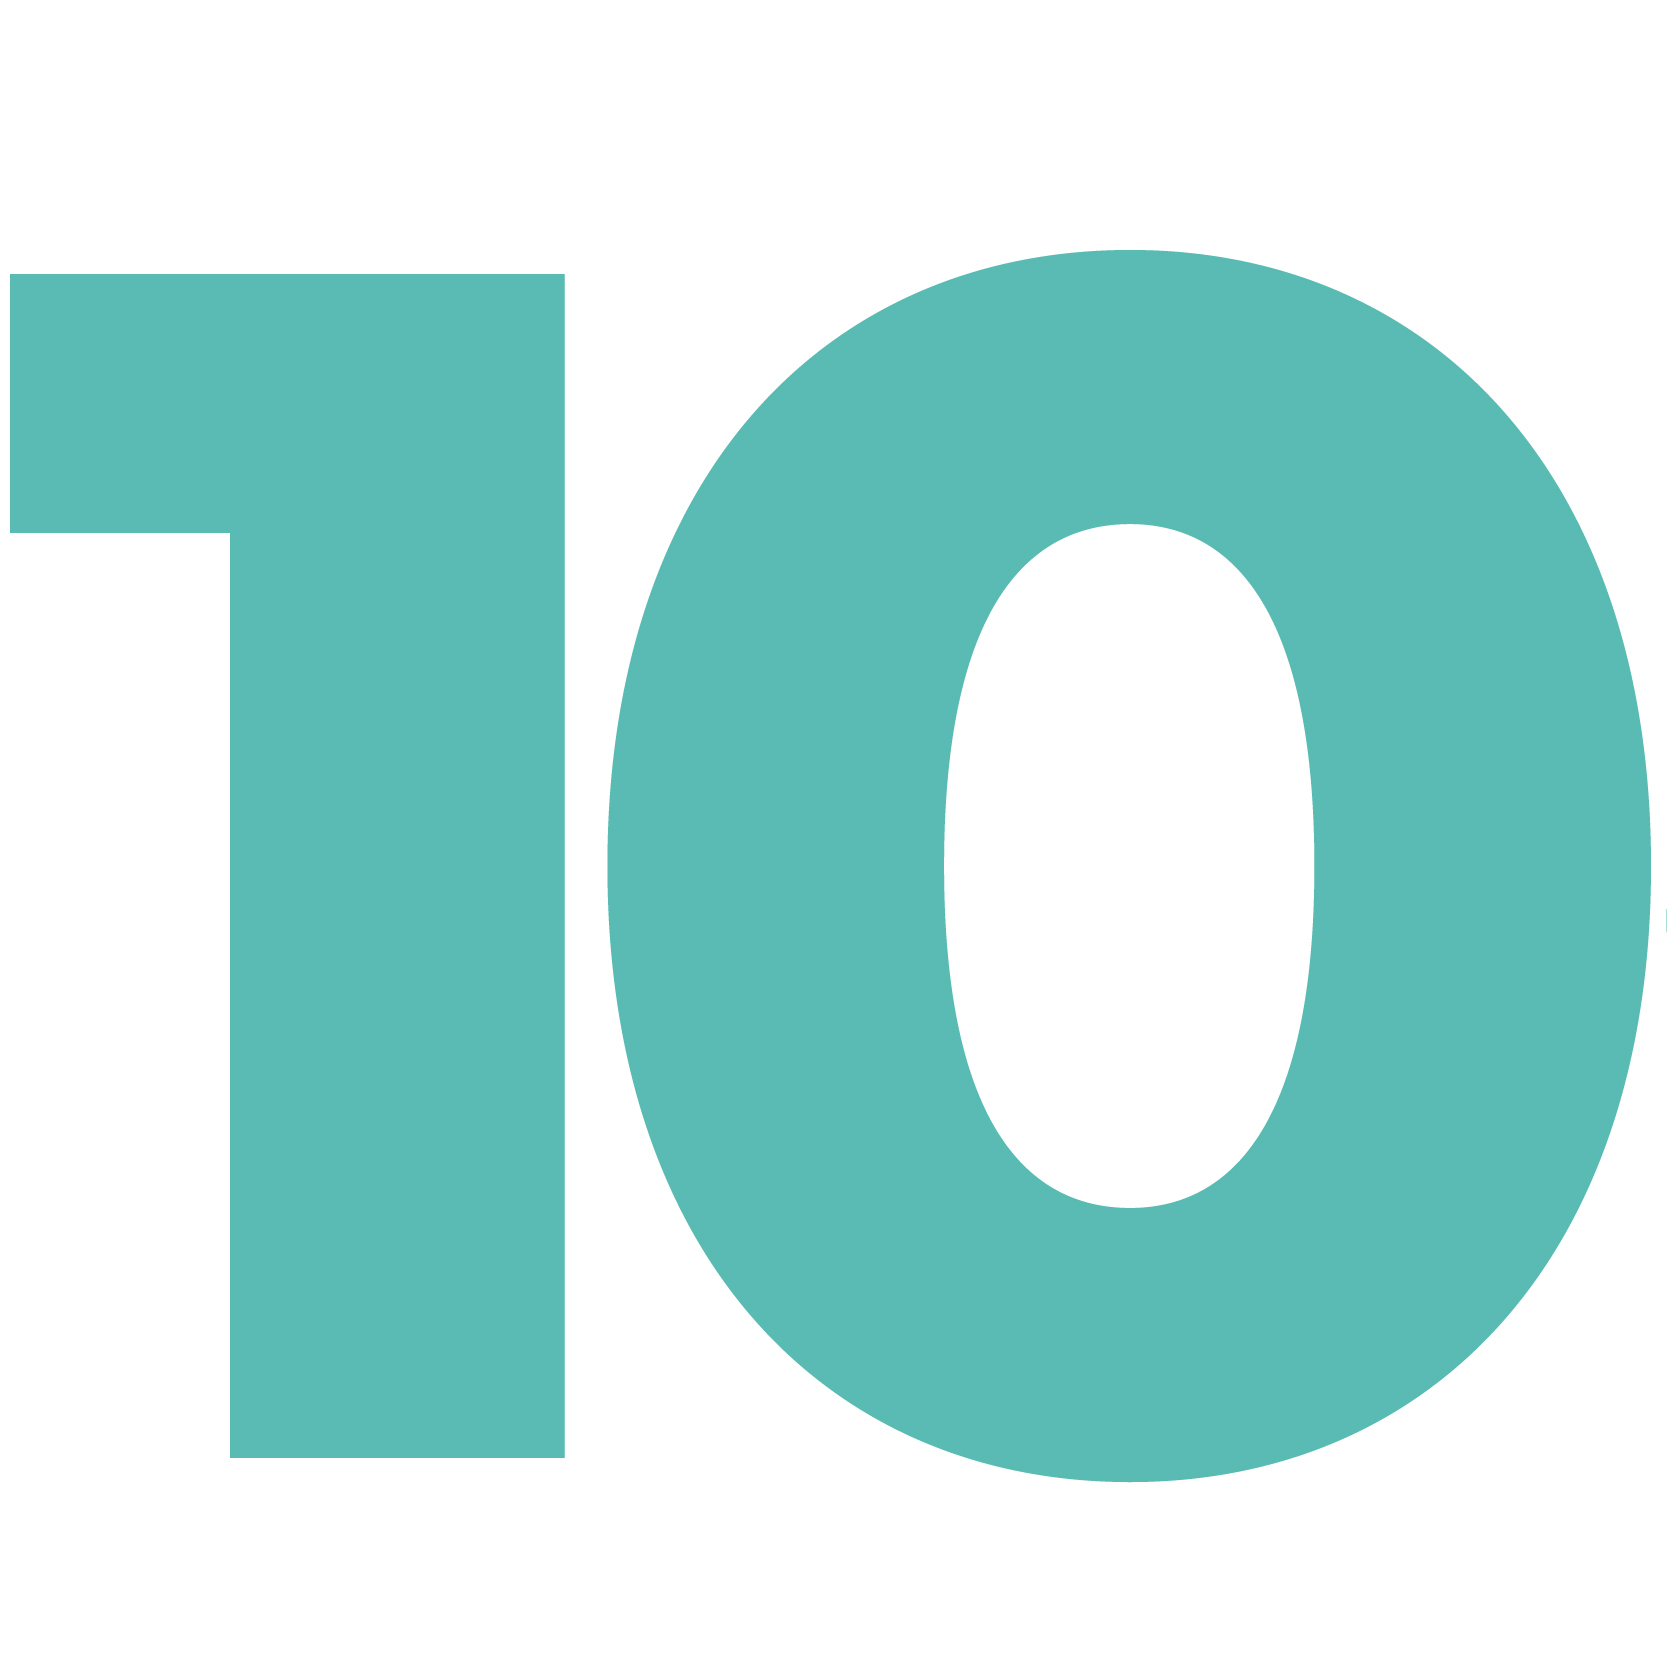 10_year-01.jpg